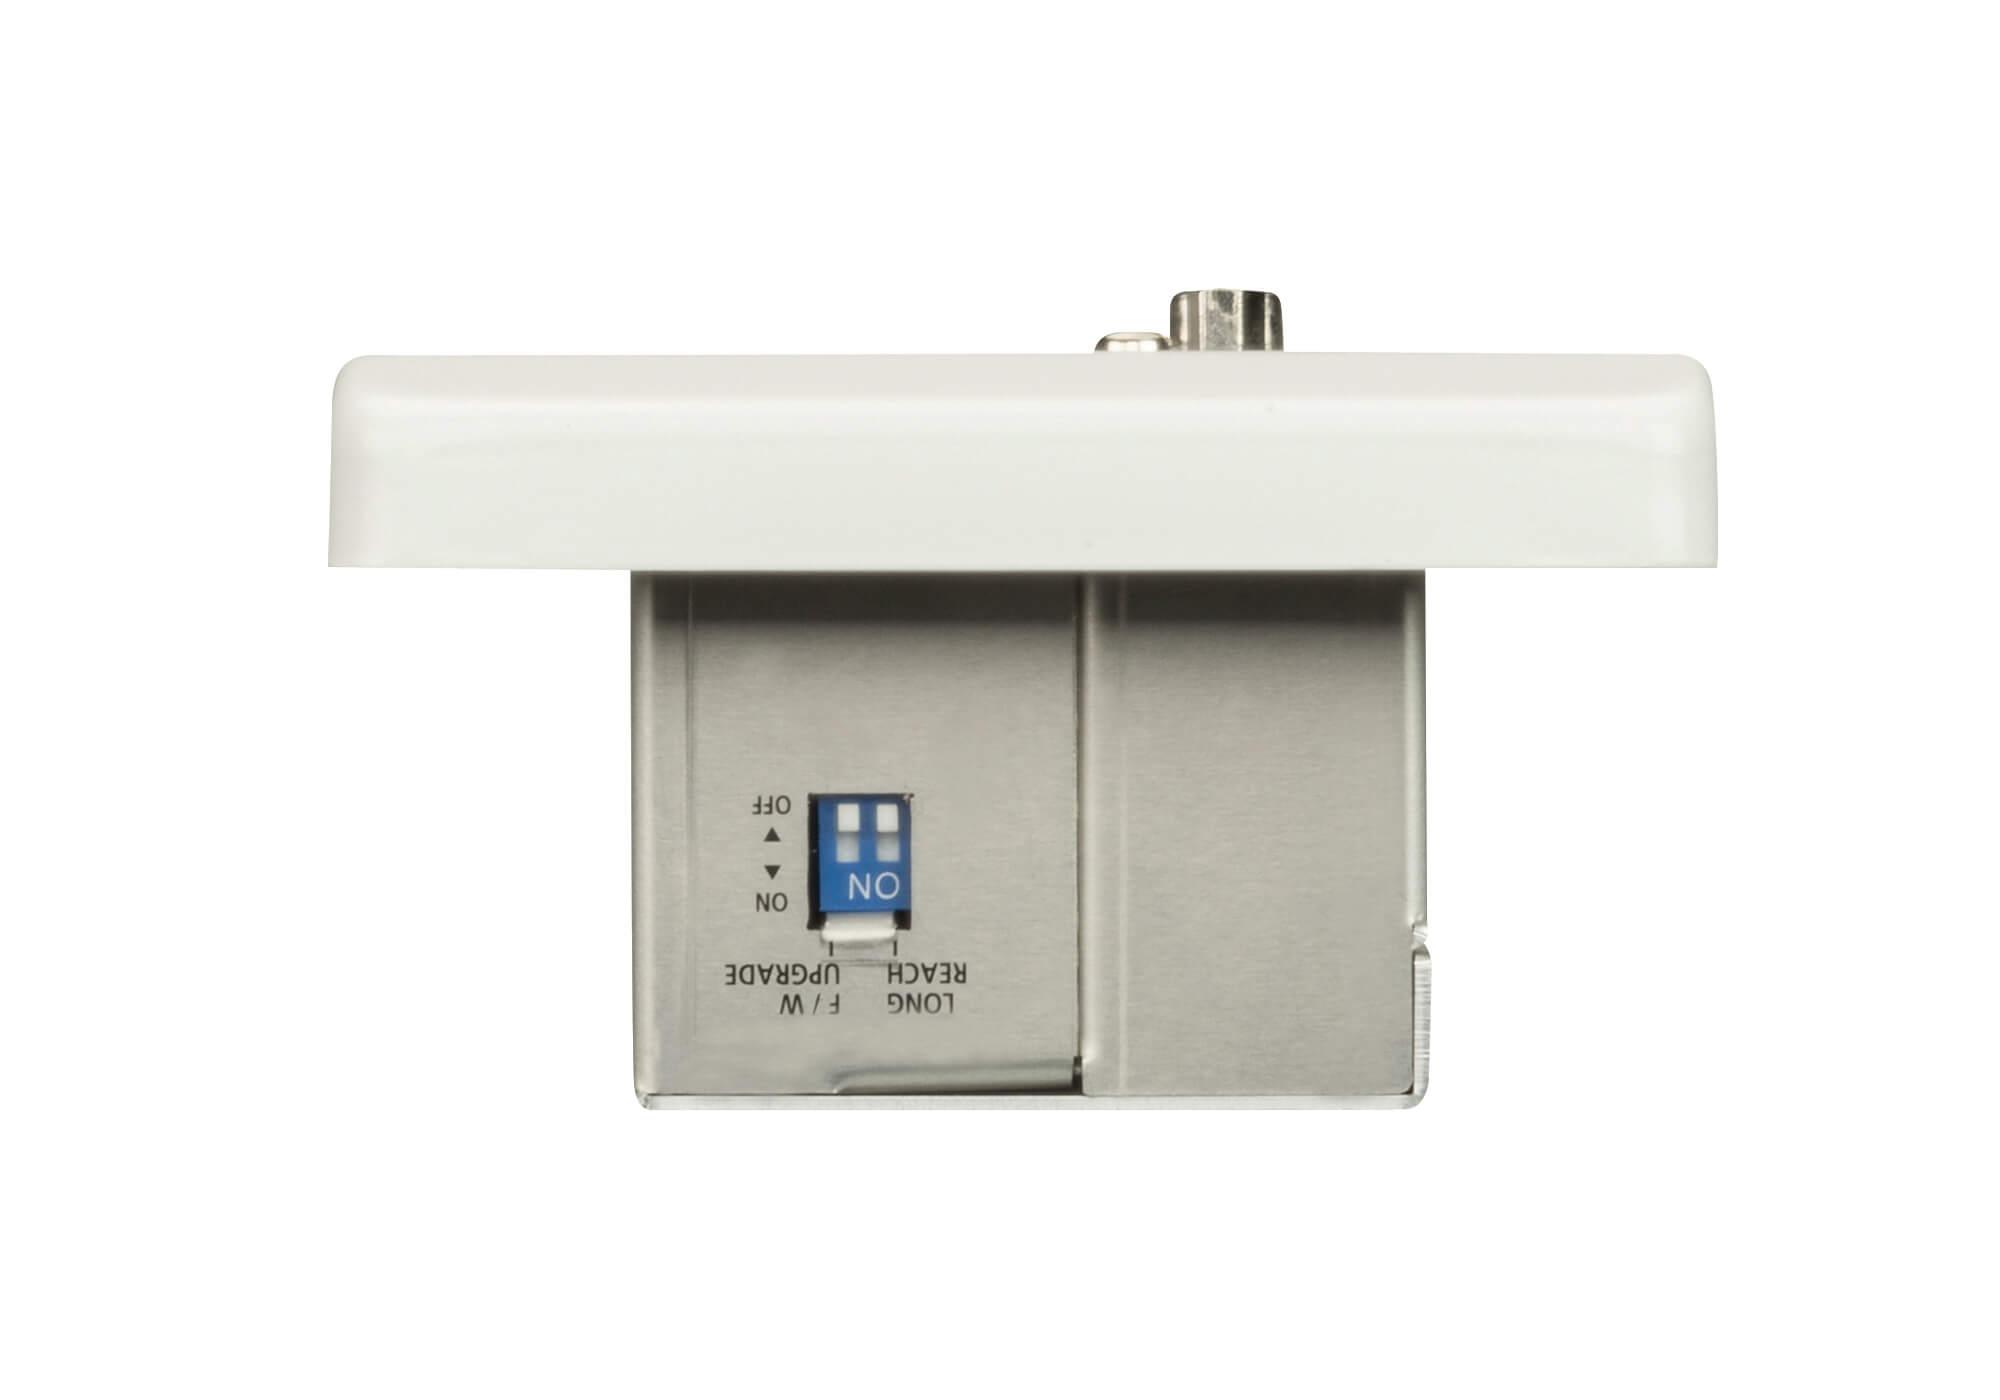 hight resolution of hdmi vga hdbaset transmitter with eu wall plate 4k 100m 2